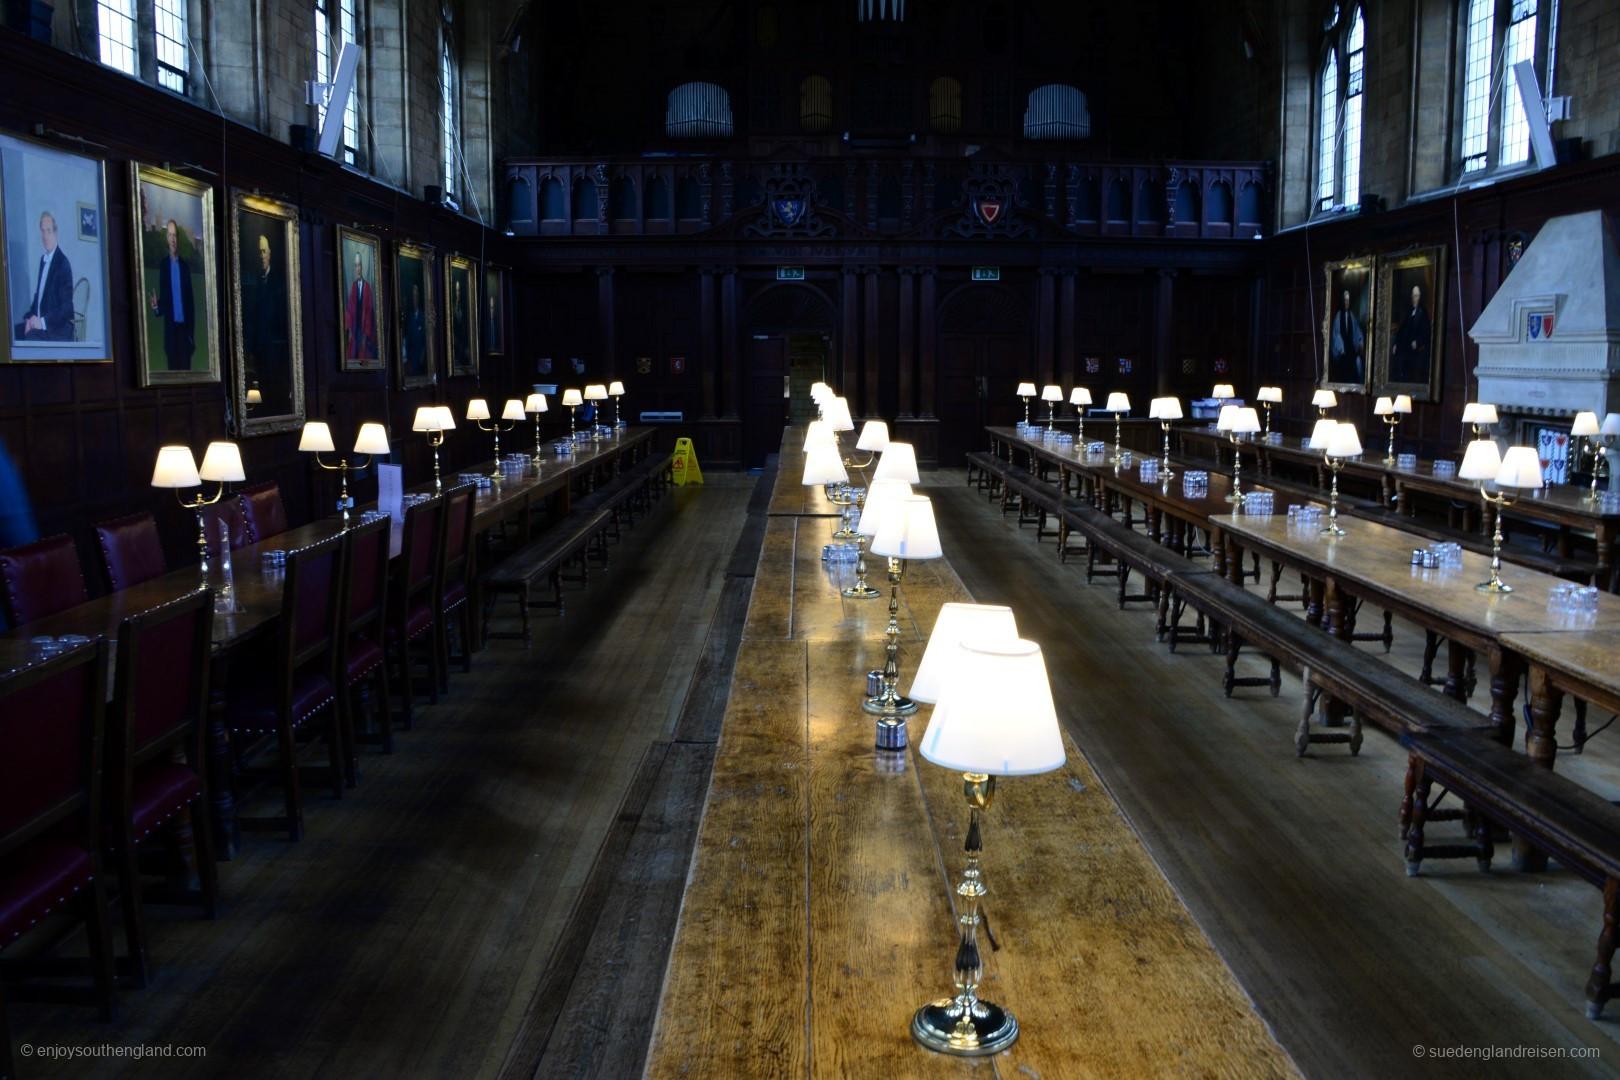 Städte - Oxford - College - Speisesaal (7)